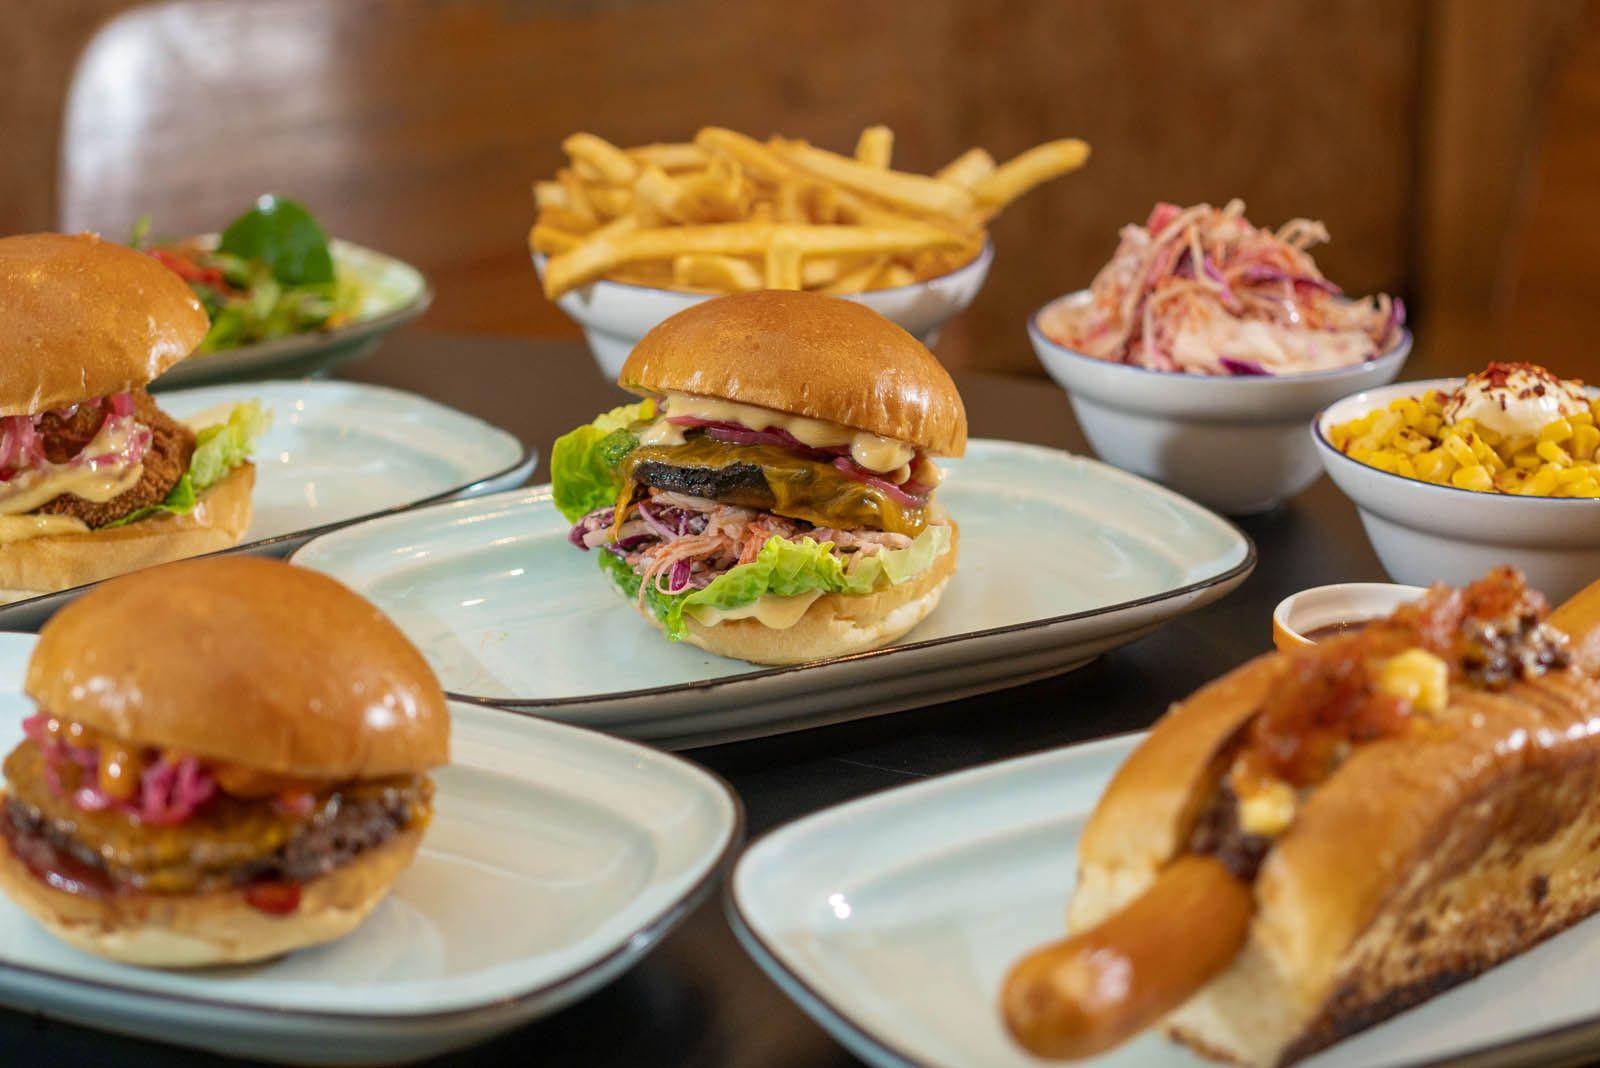 Tiga Roti's Halal-friendly burgers